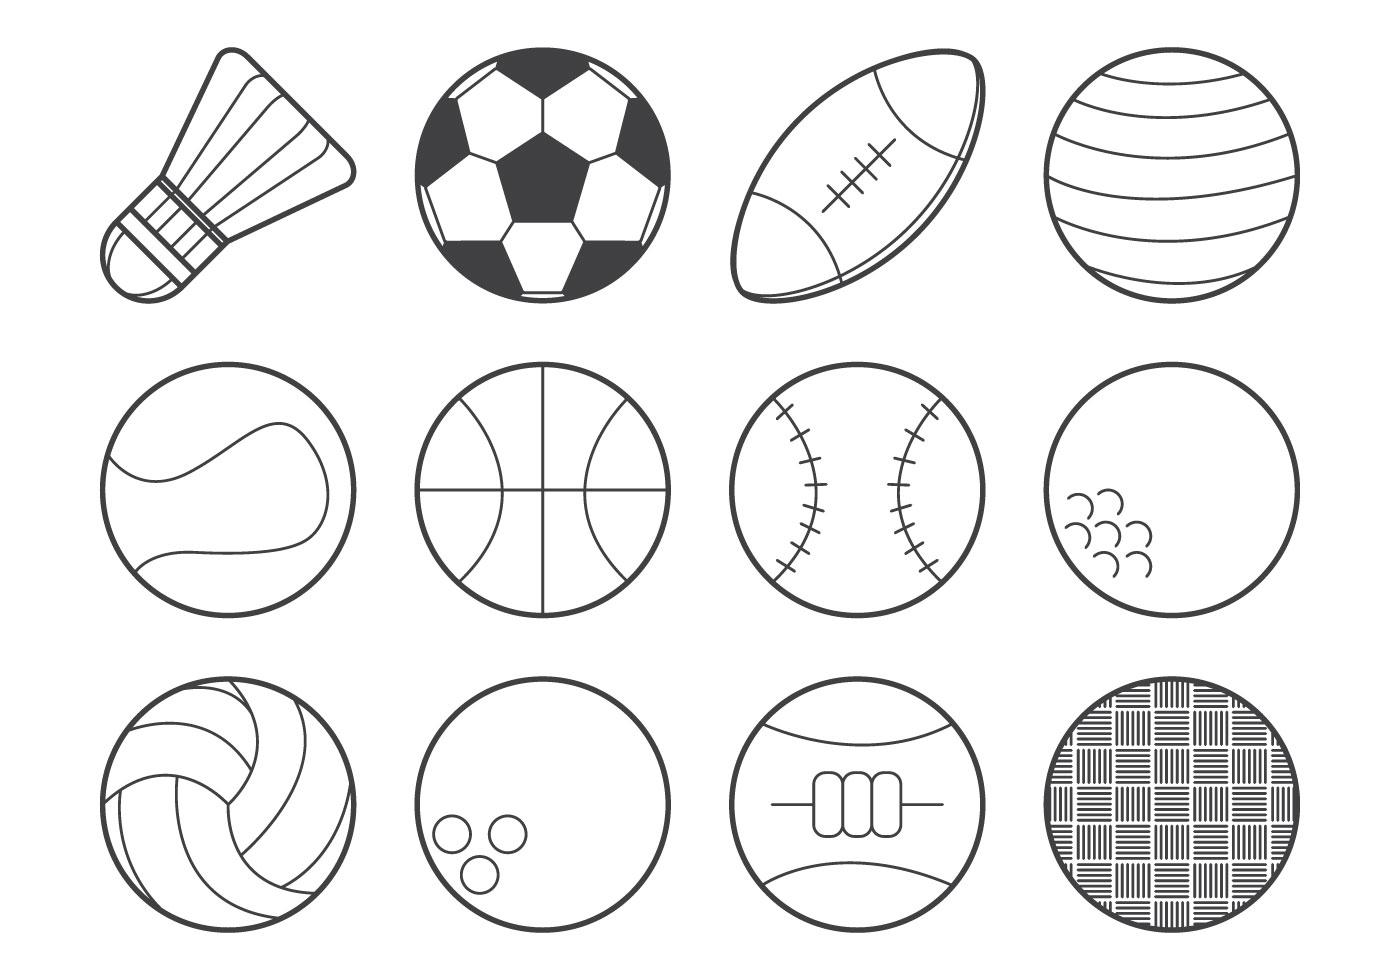 ball sports vector icon dodgeball player icons balls silhouette vecteezy chicken cartoon poster vectors dodge edit